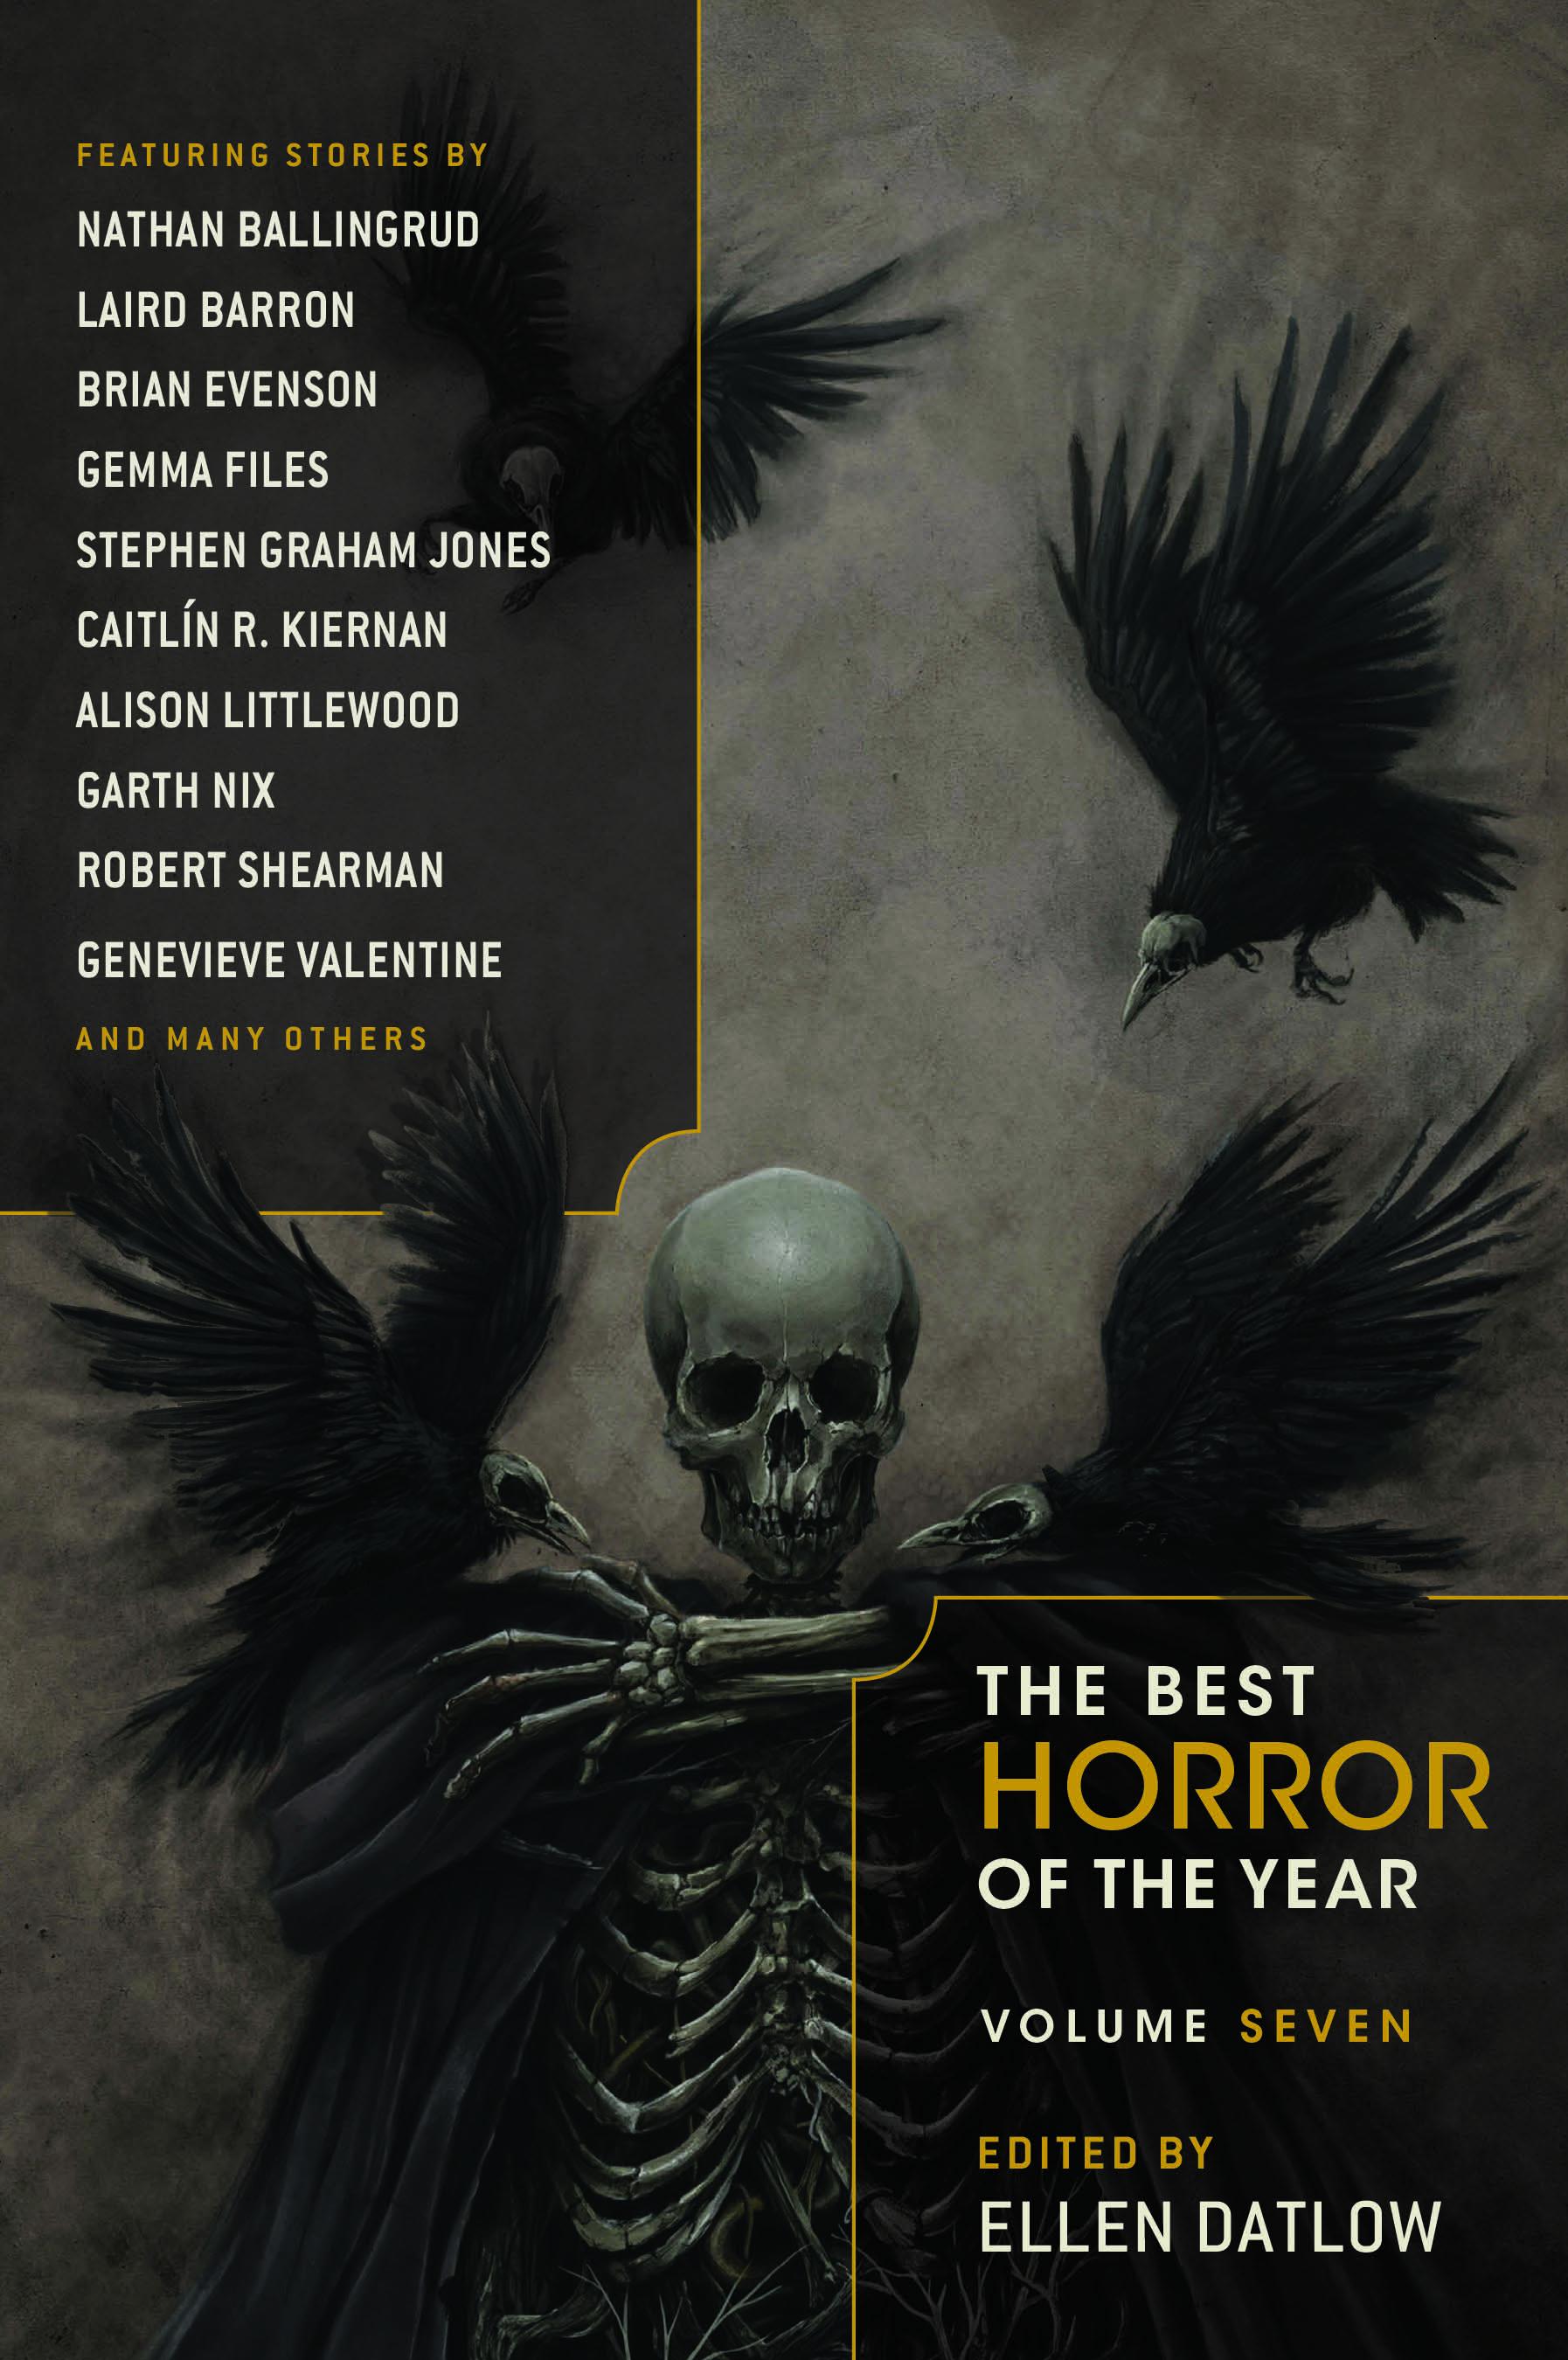 Best Horror vol 7 final cover